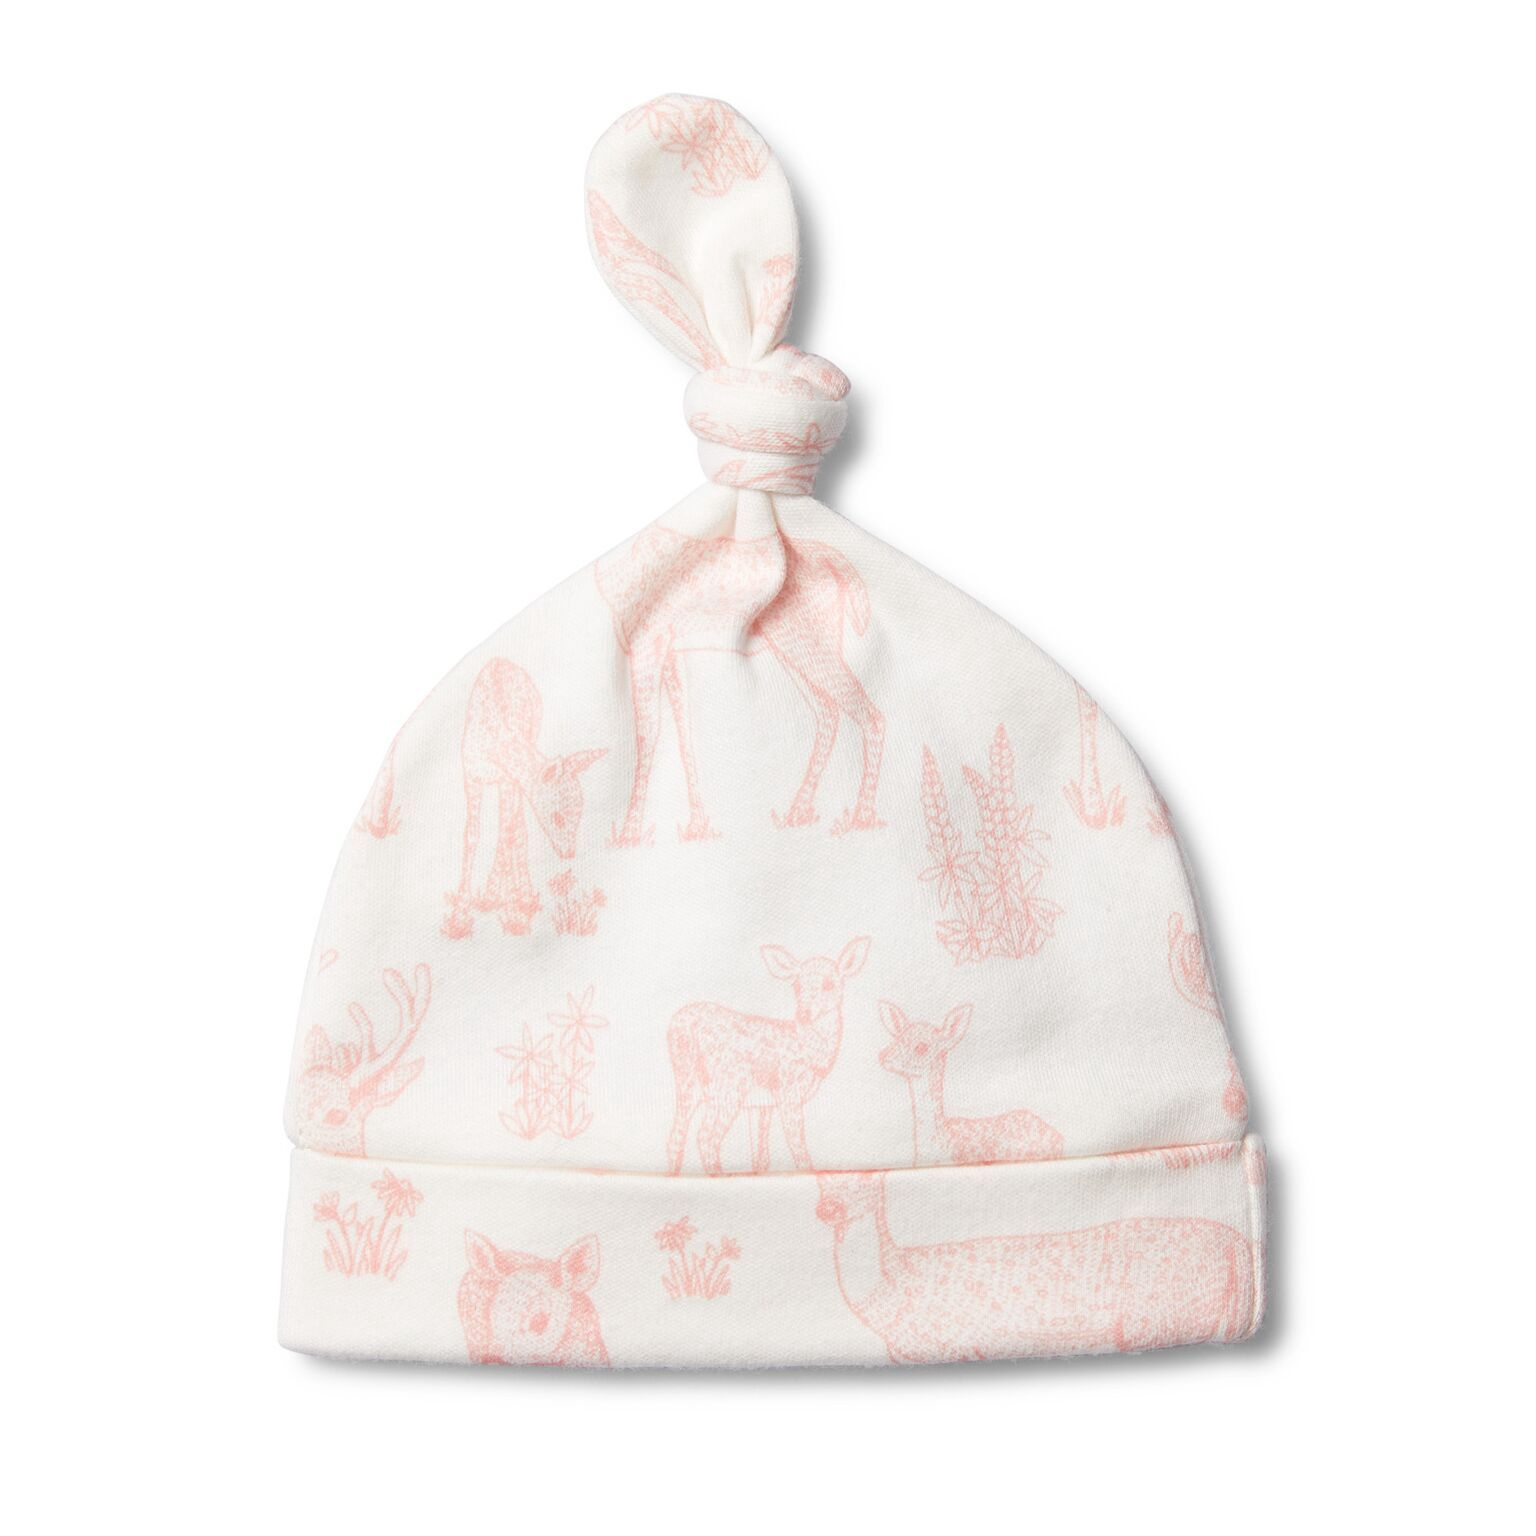 WF Oh Dear knot hat